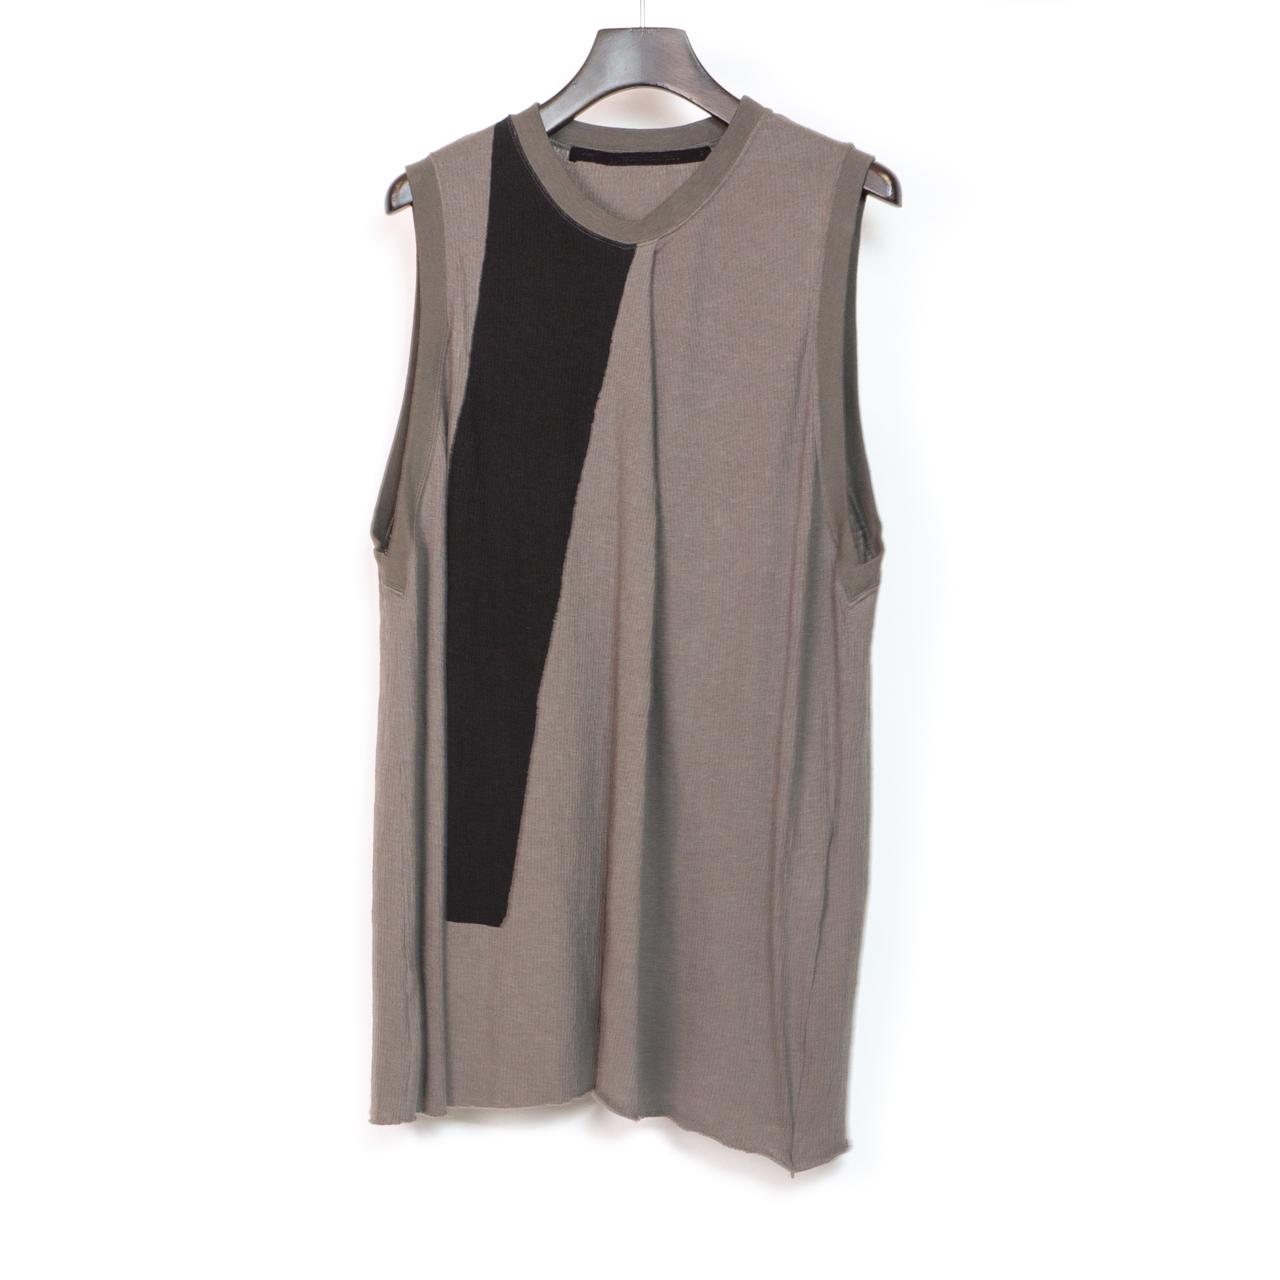 697CUM8-P-GRAY / フロントドレープノースリーブシャツ